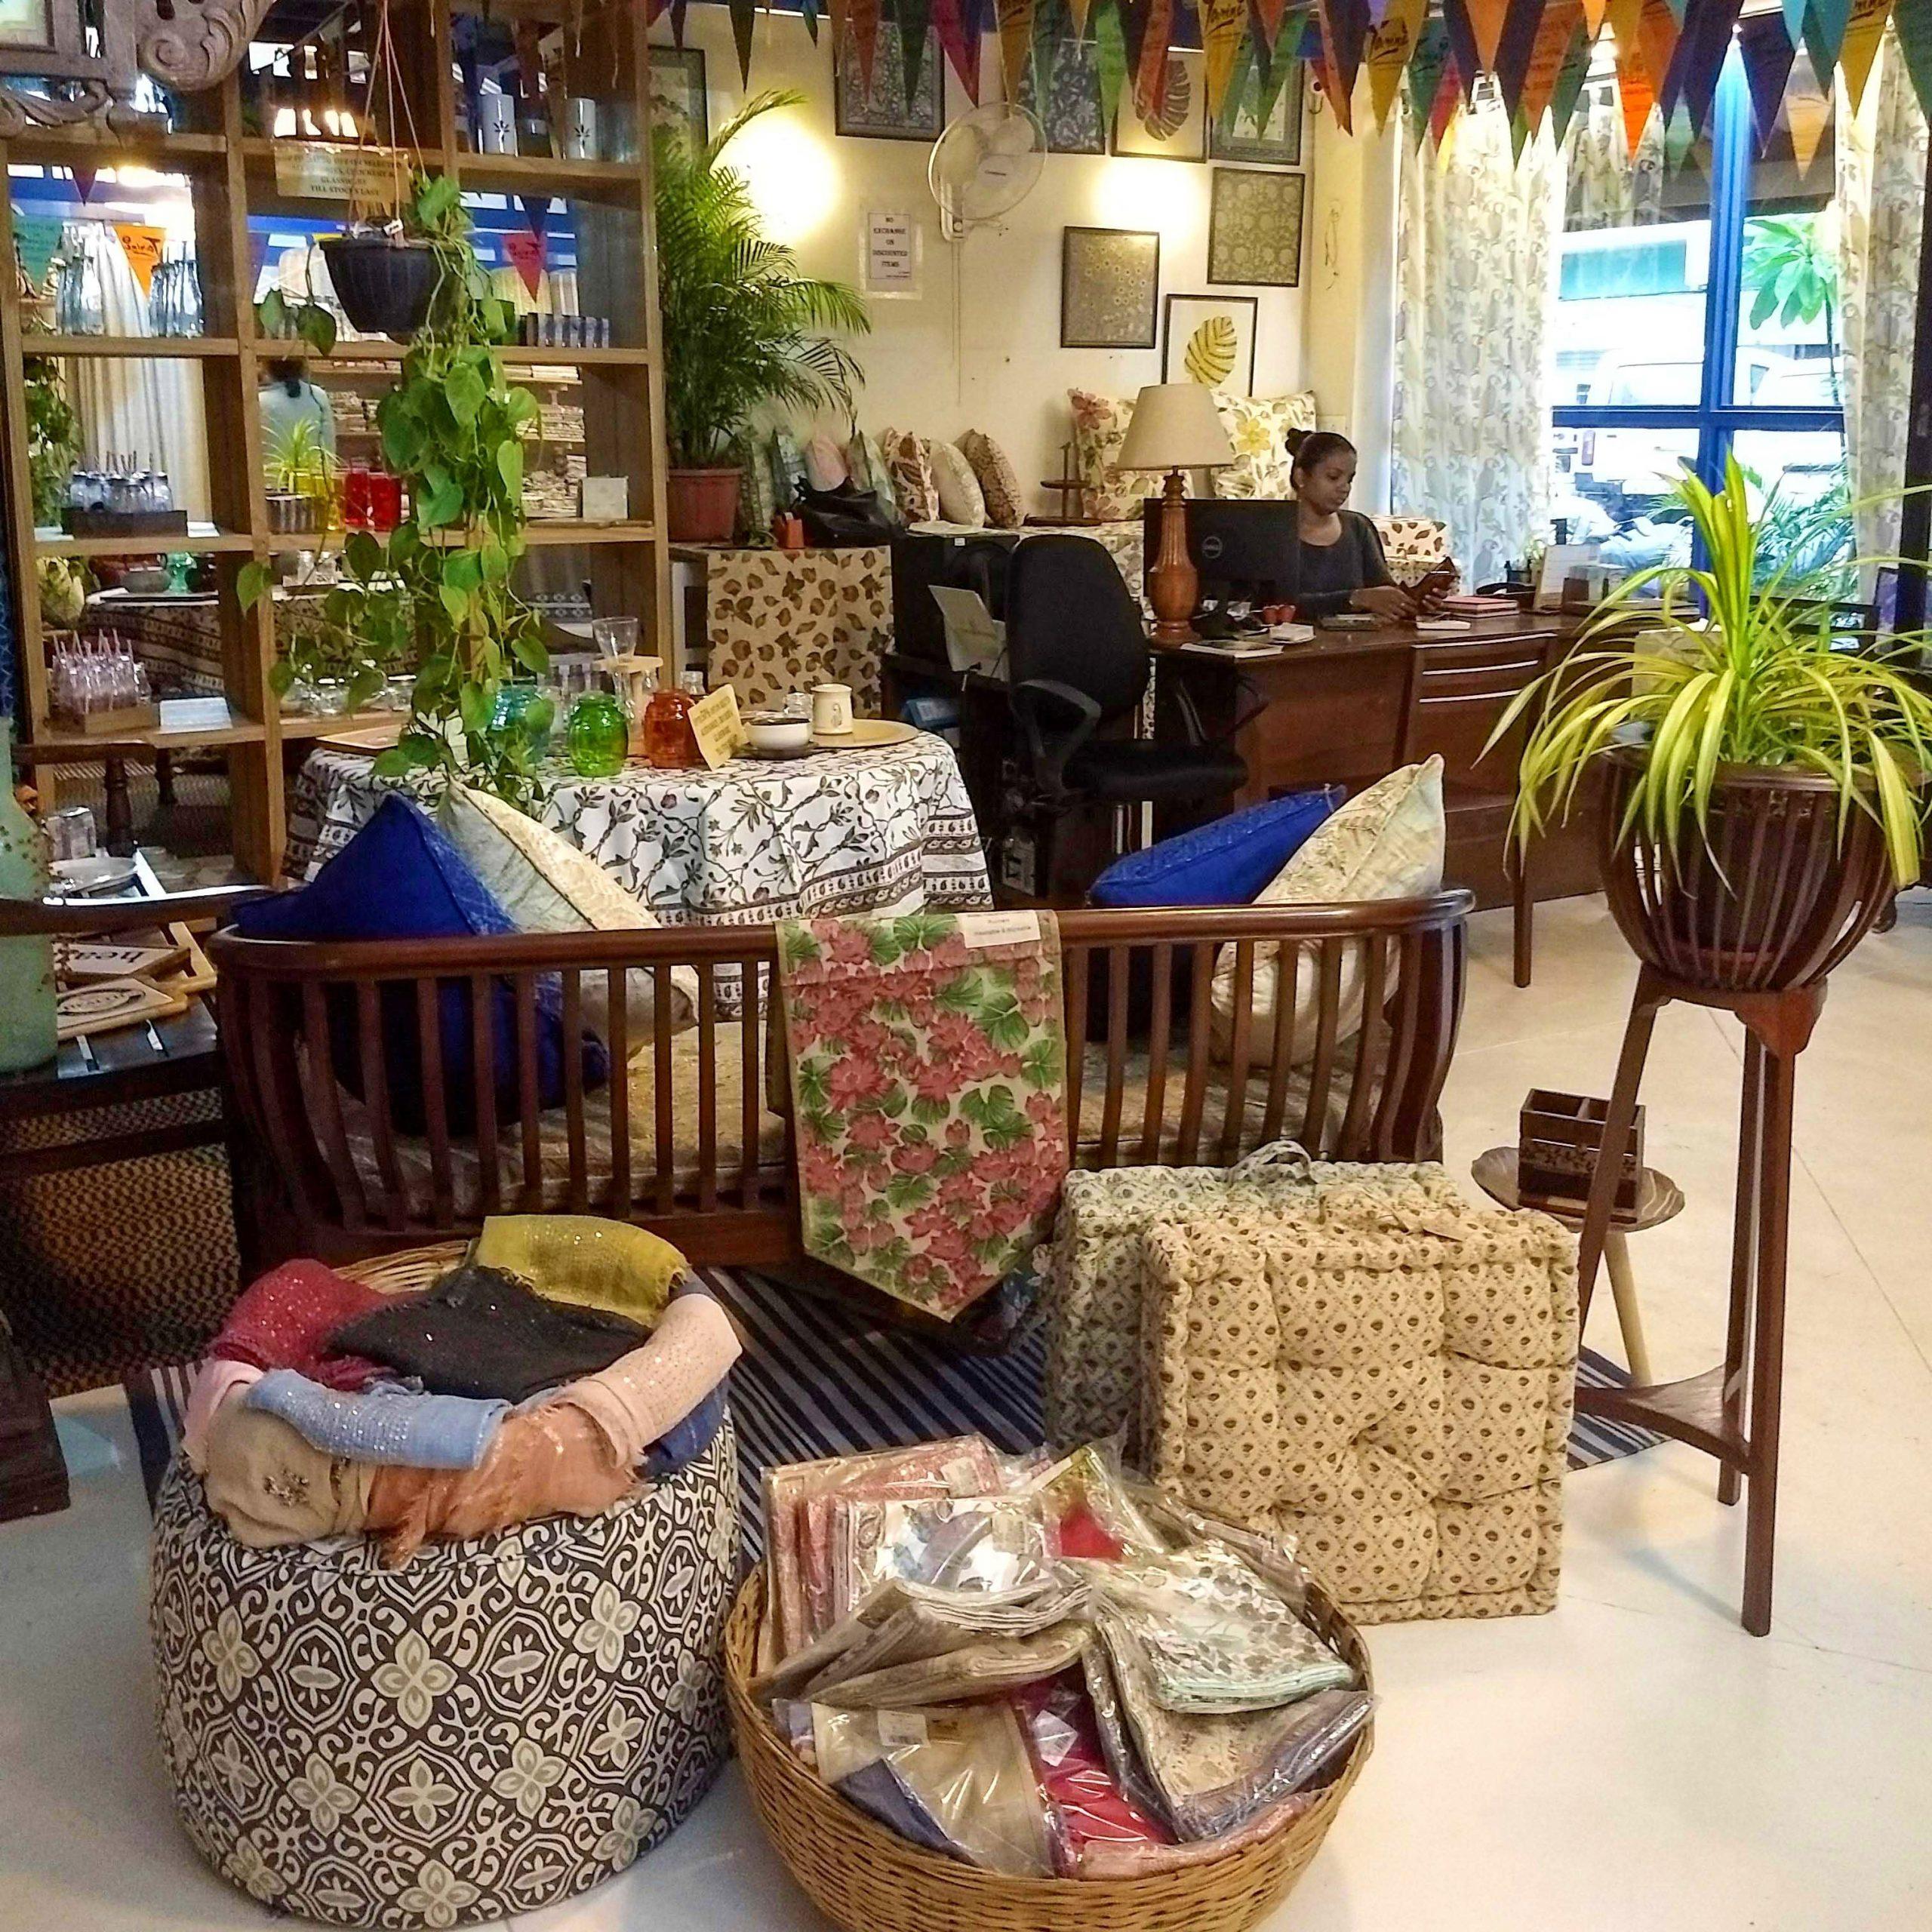 Tarini, Goa: Best Place To Buy Home Linen | Lbb Goa dedans Table De Jardin Super U